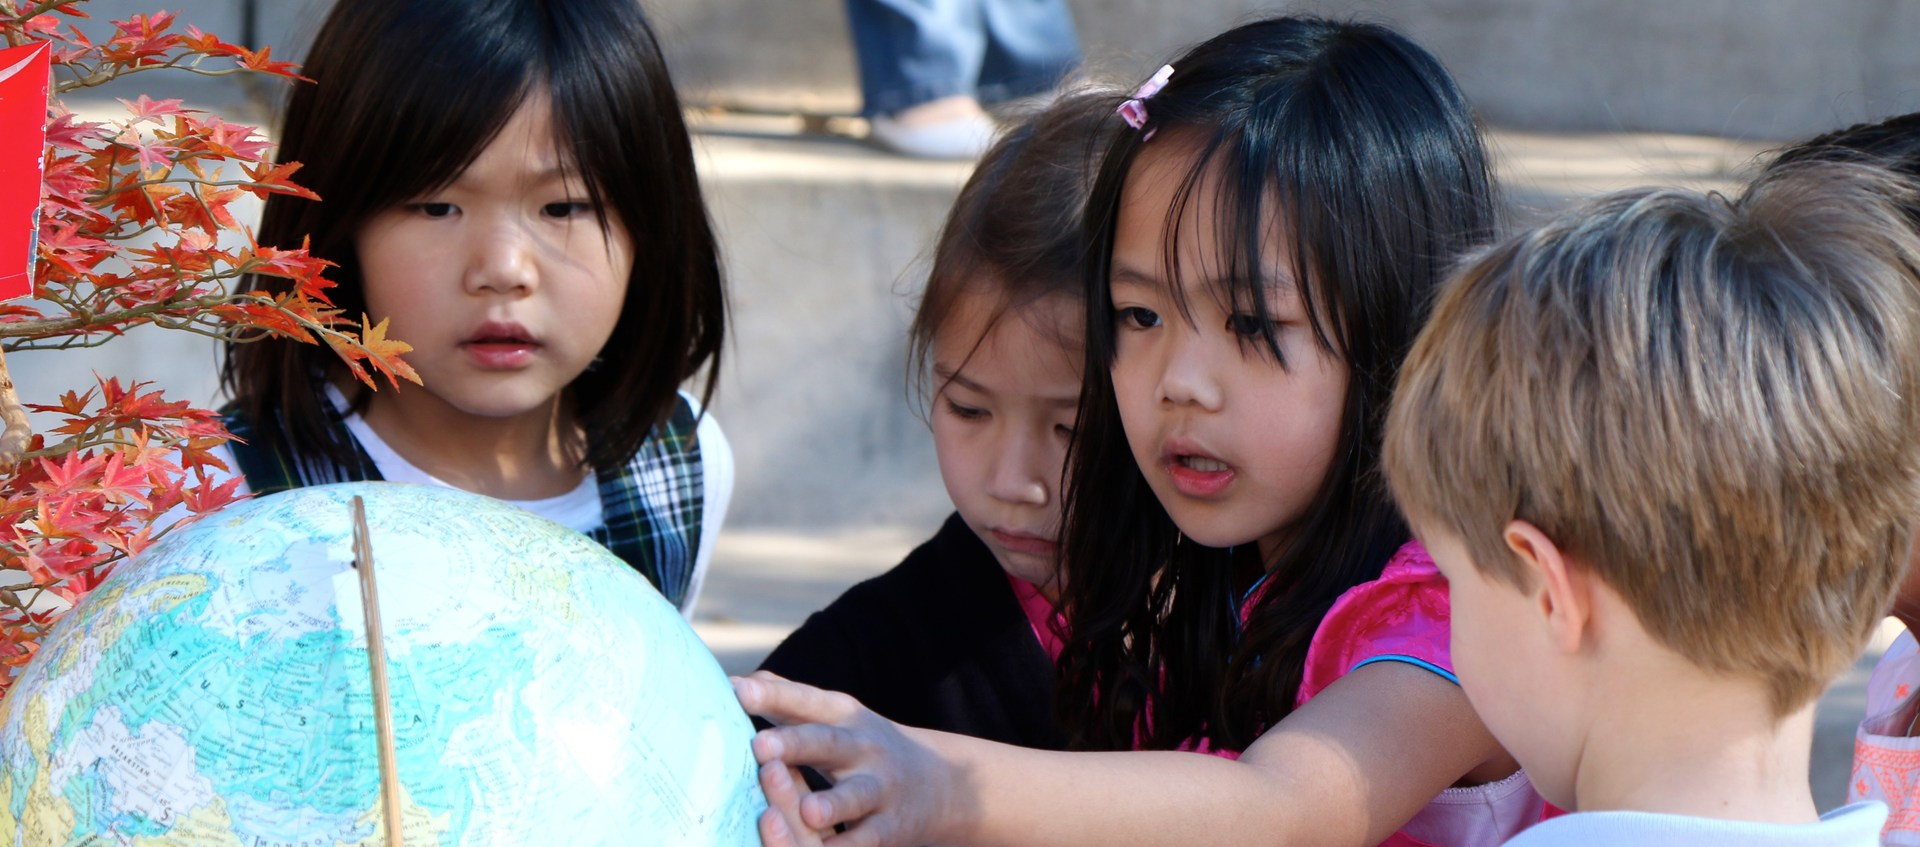 Students looking at a globe.